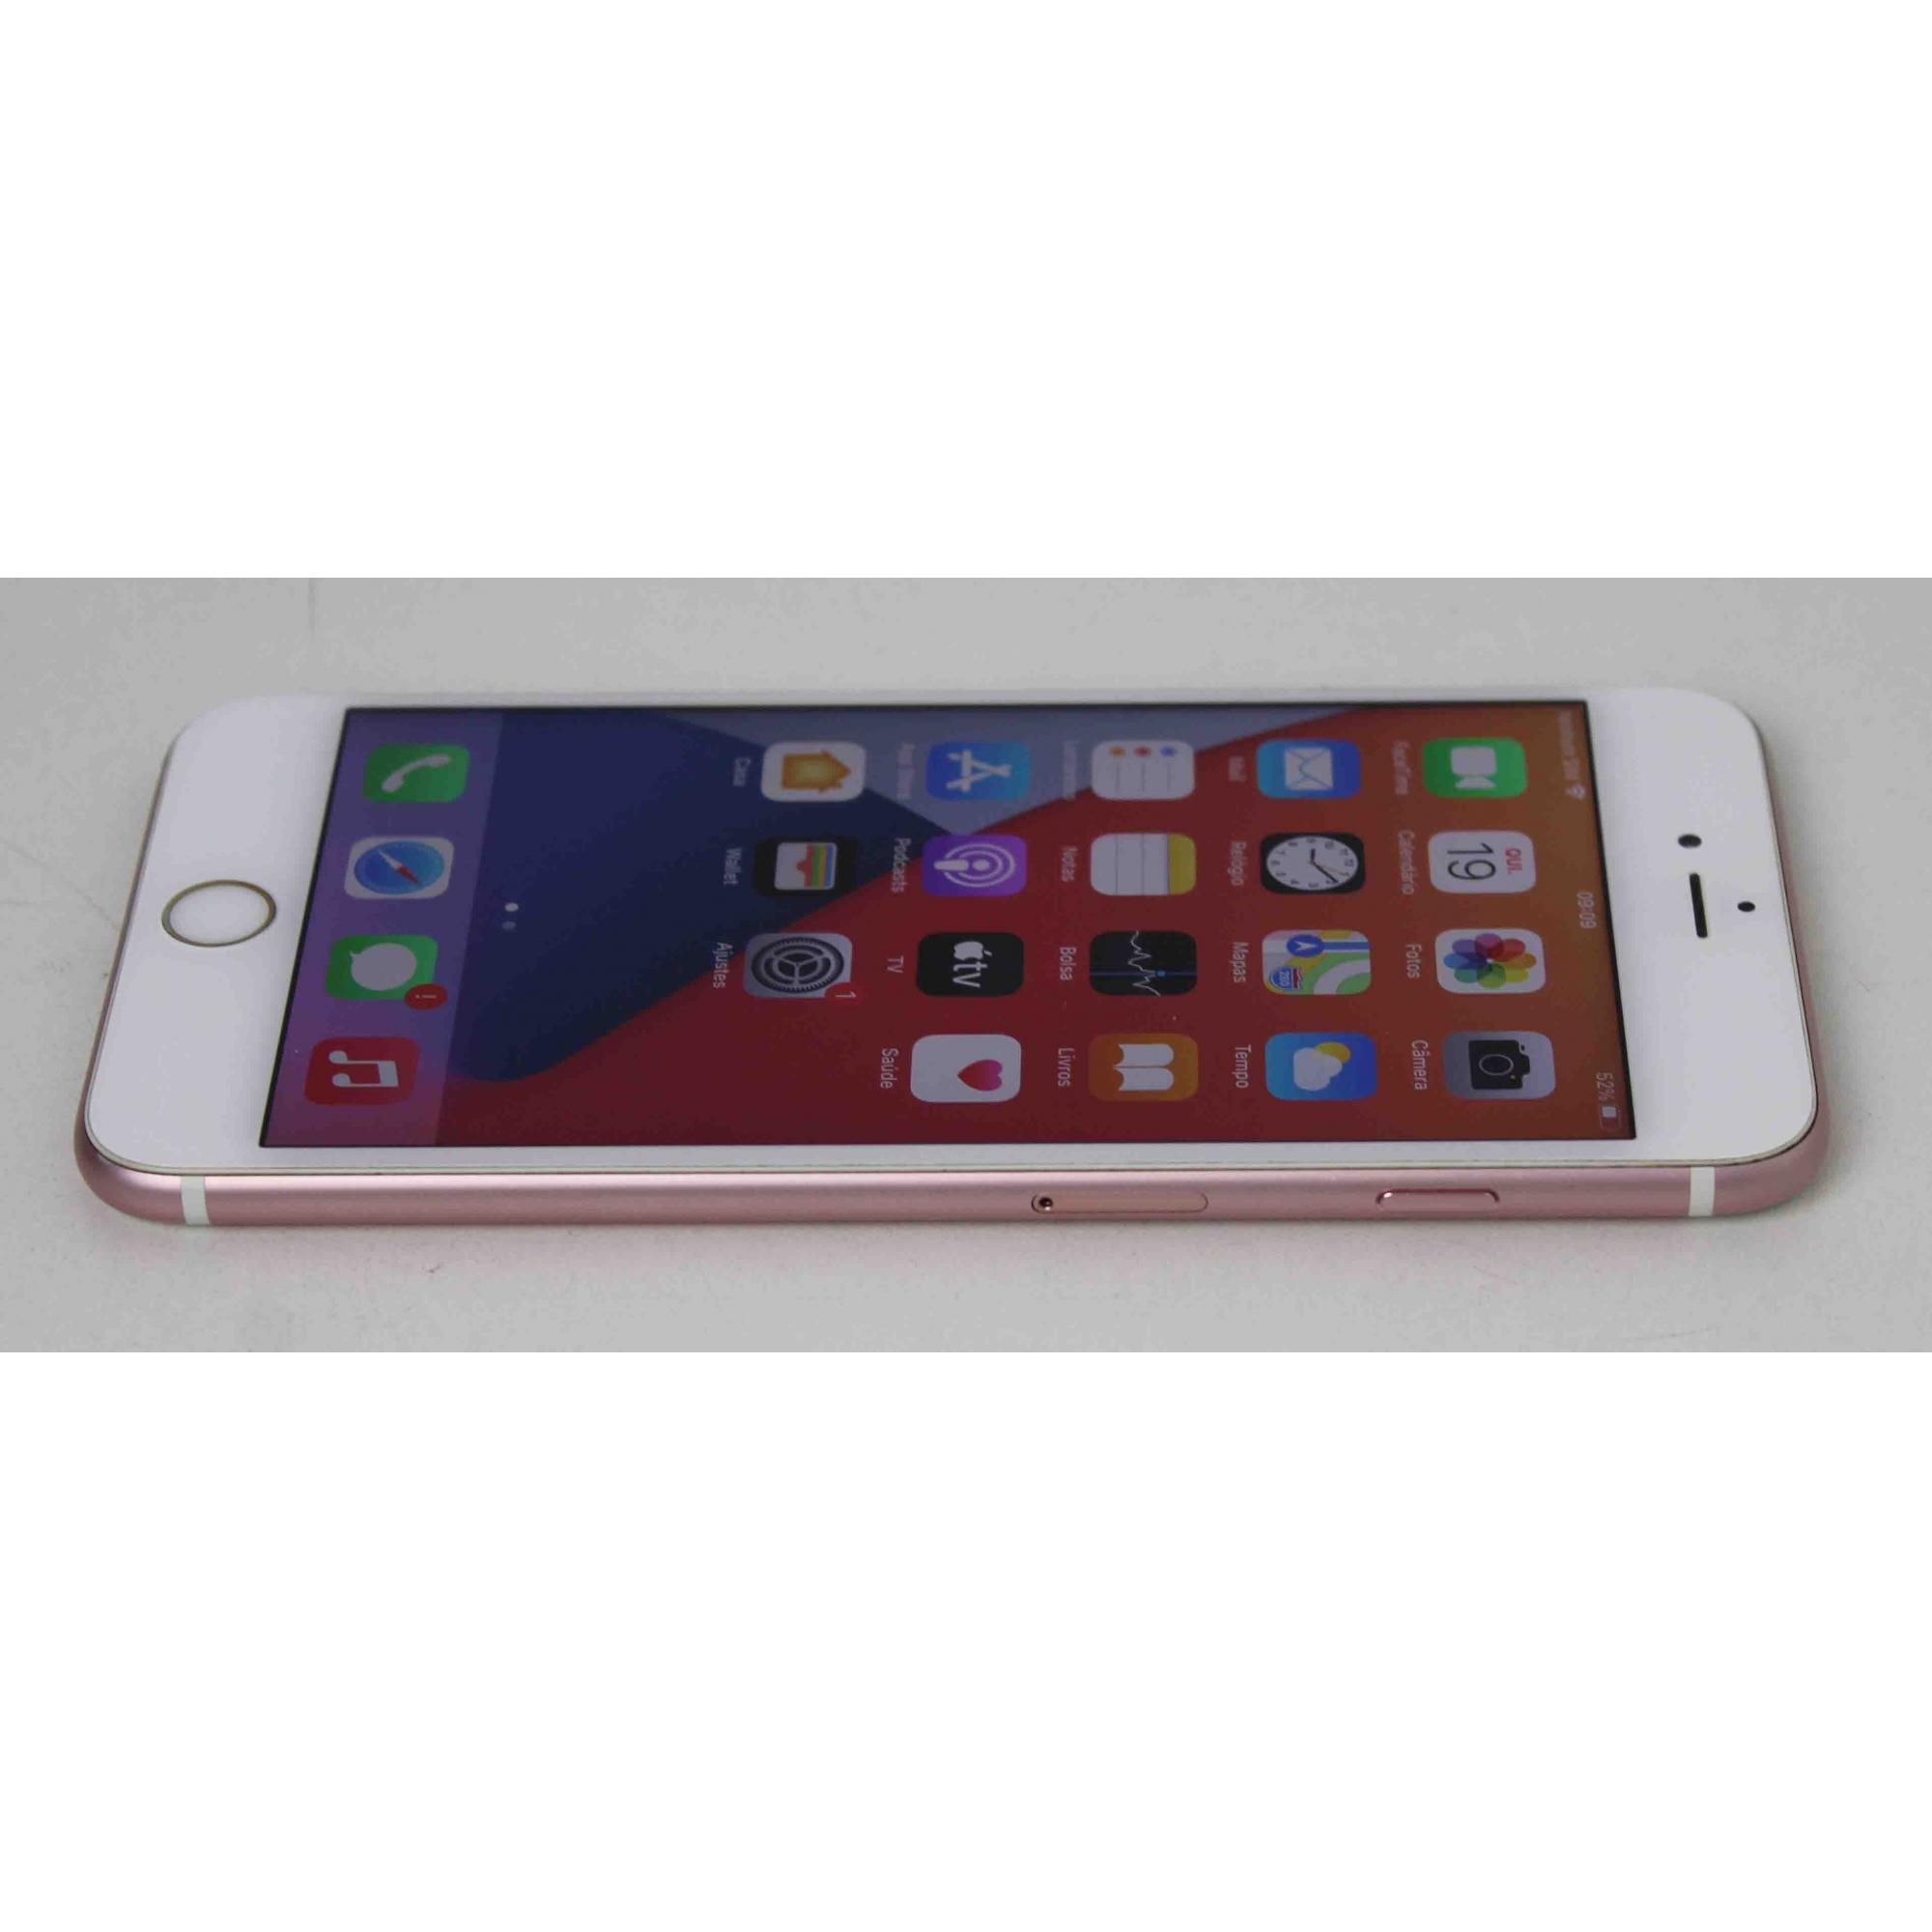 "iPhone 6s Plus NKUG2BZ/A  5.5"" 128GB - Rosa"